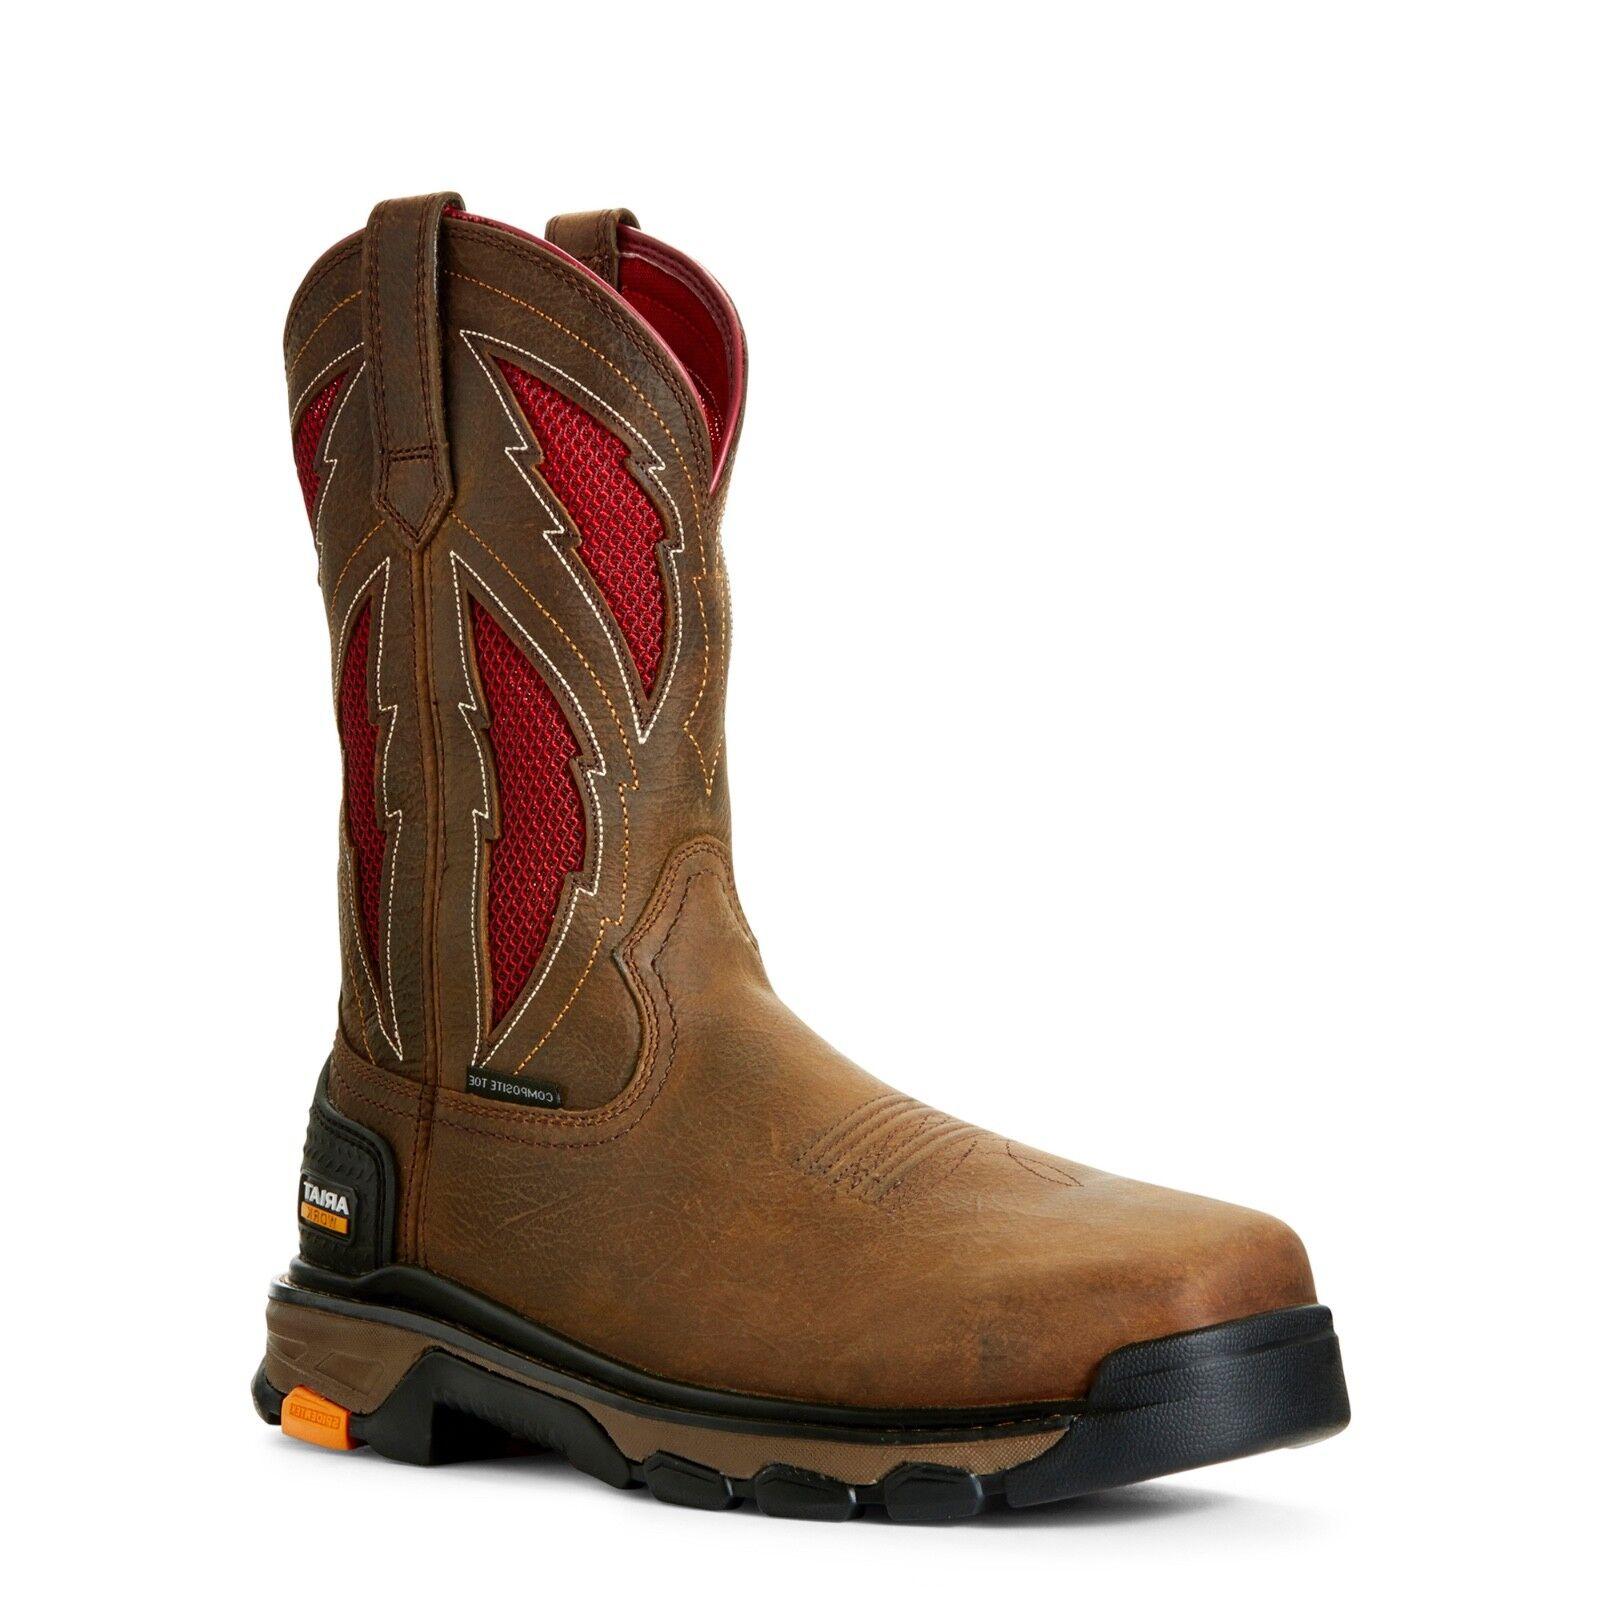 Ariat® Men's Intrepid VentTEK Lightning Safety Toe Work stivali 10027299